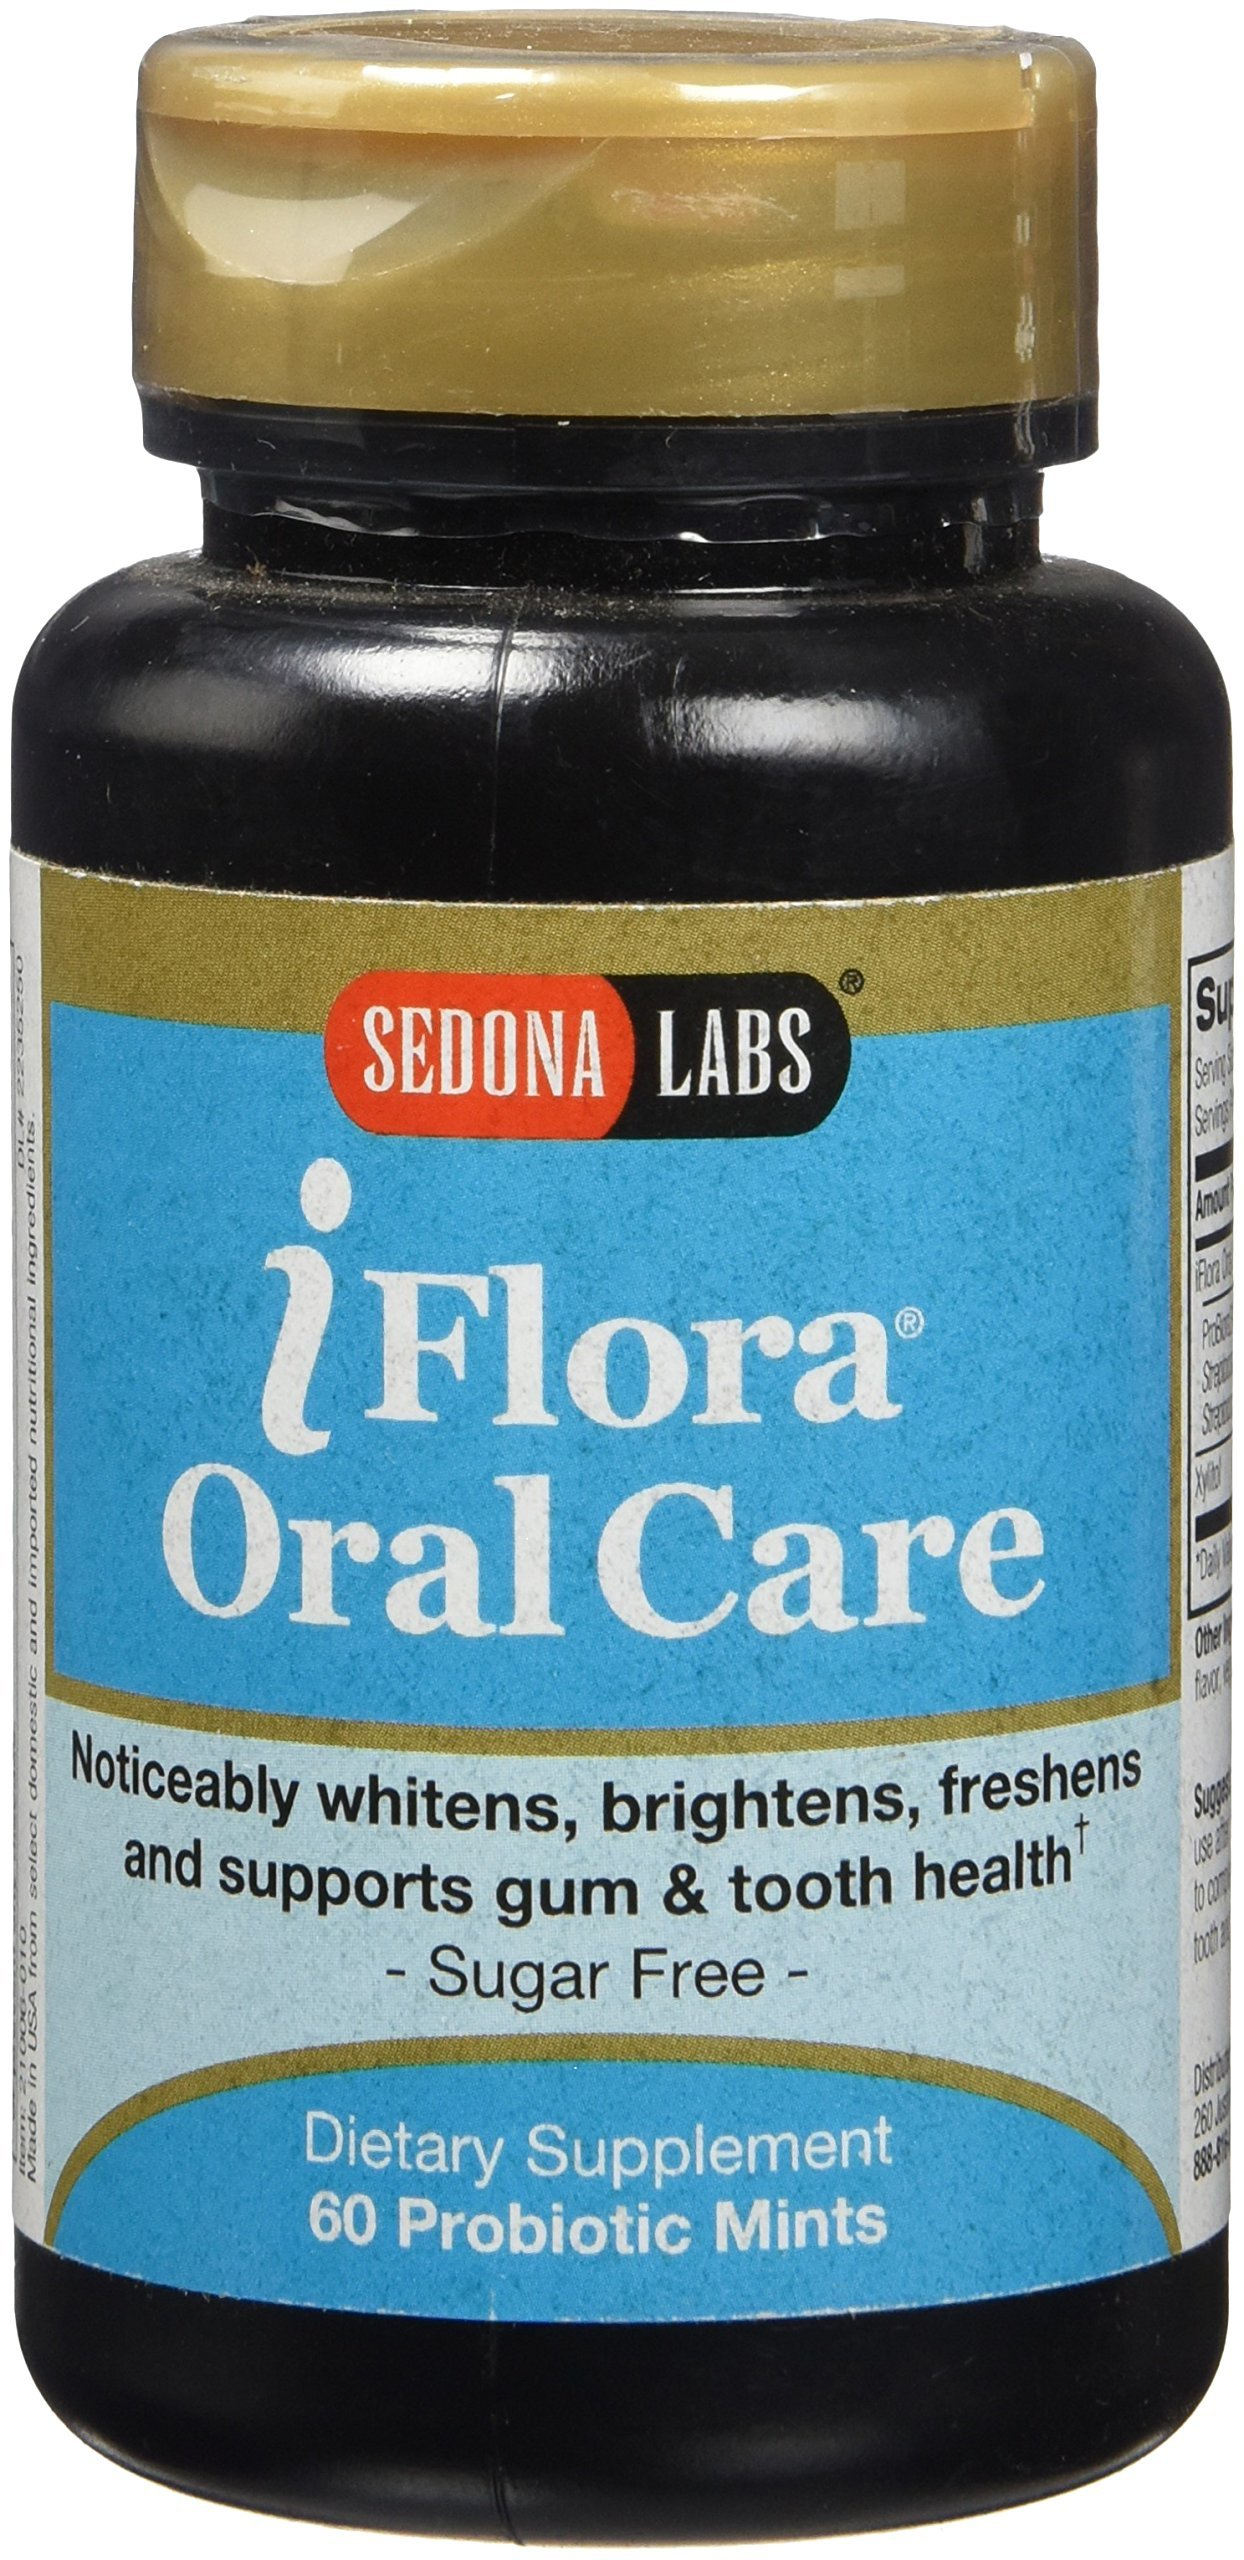 Sedona Labs Iflora Oral Care Probiotic Mints, 60 Count